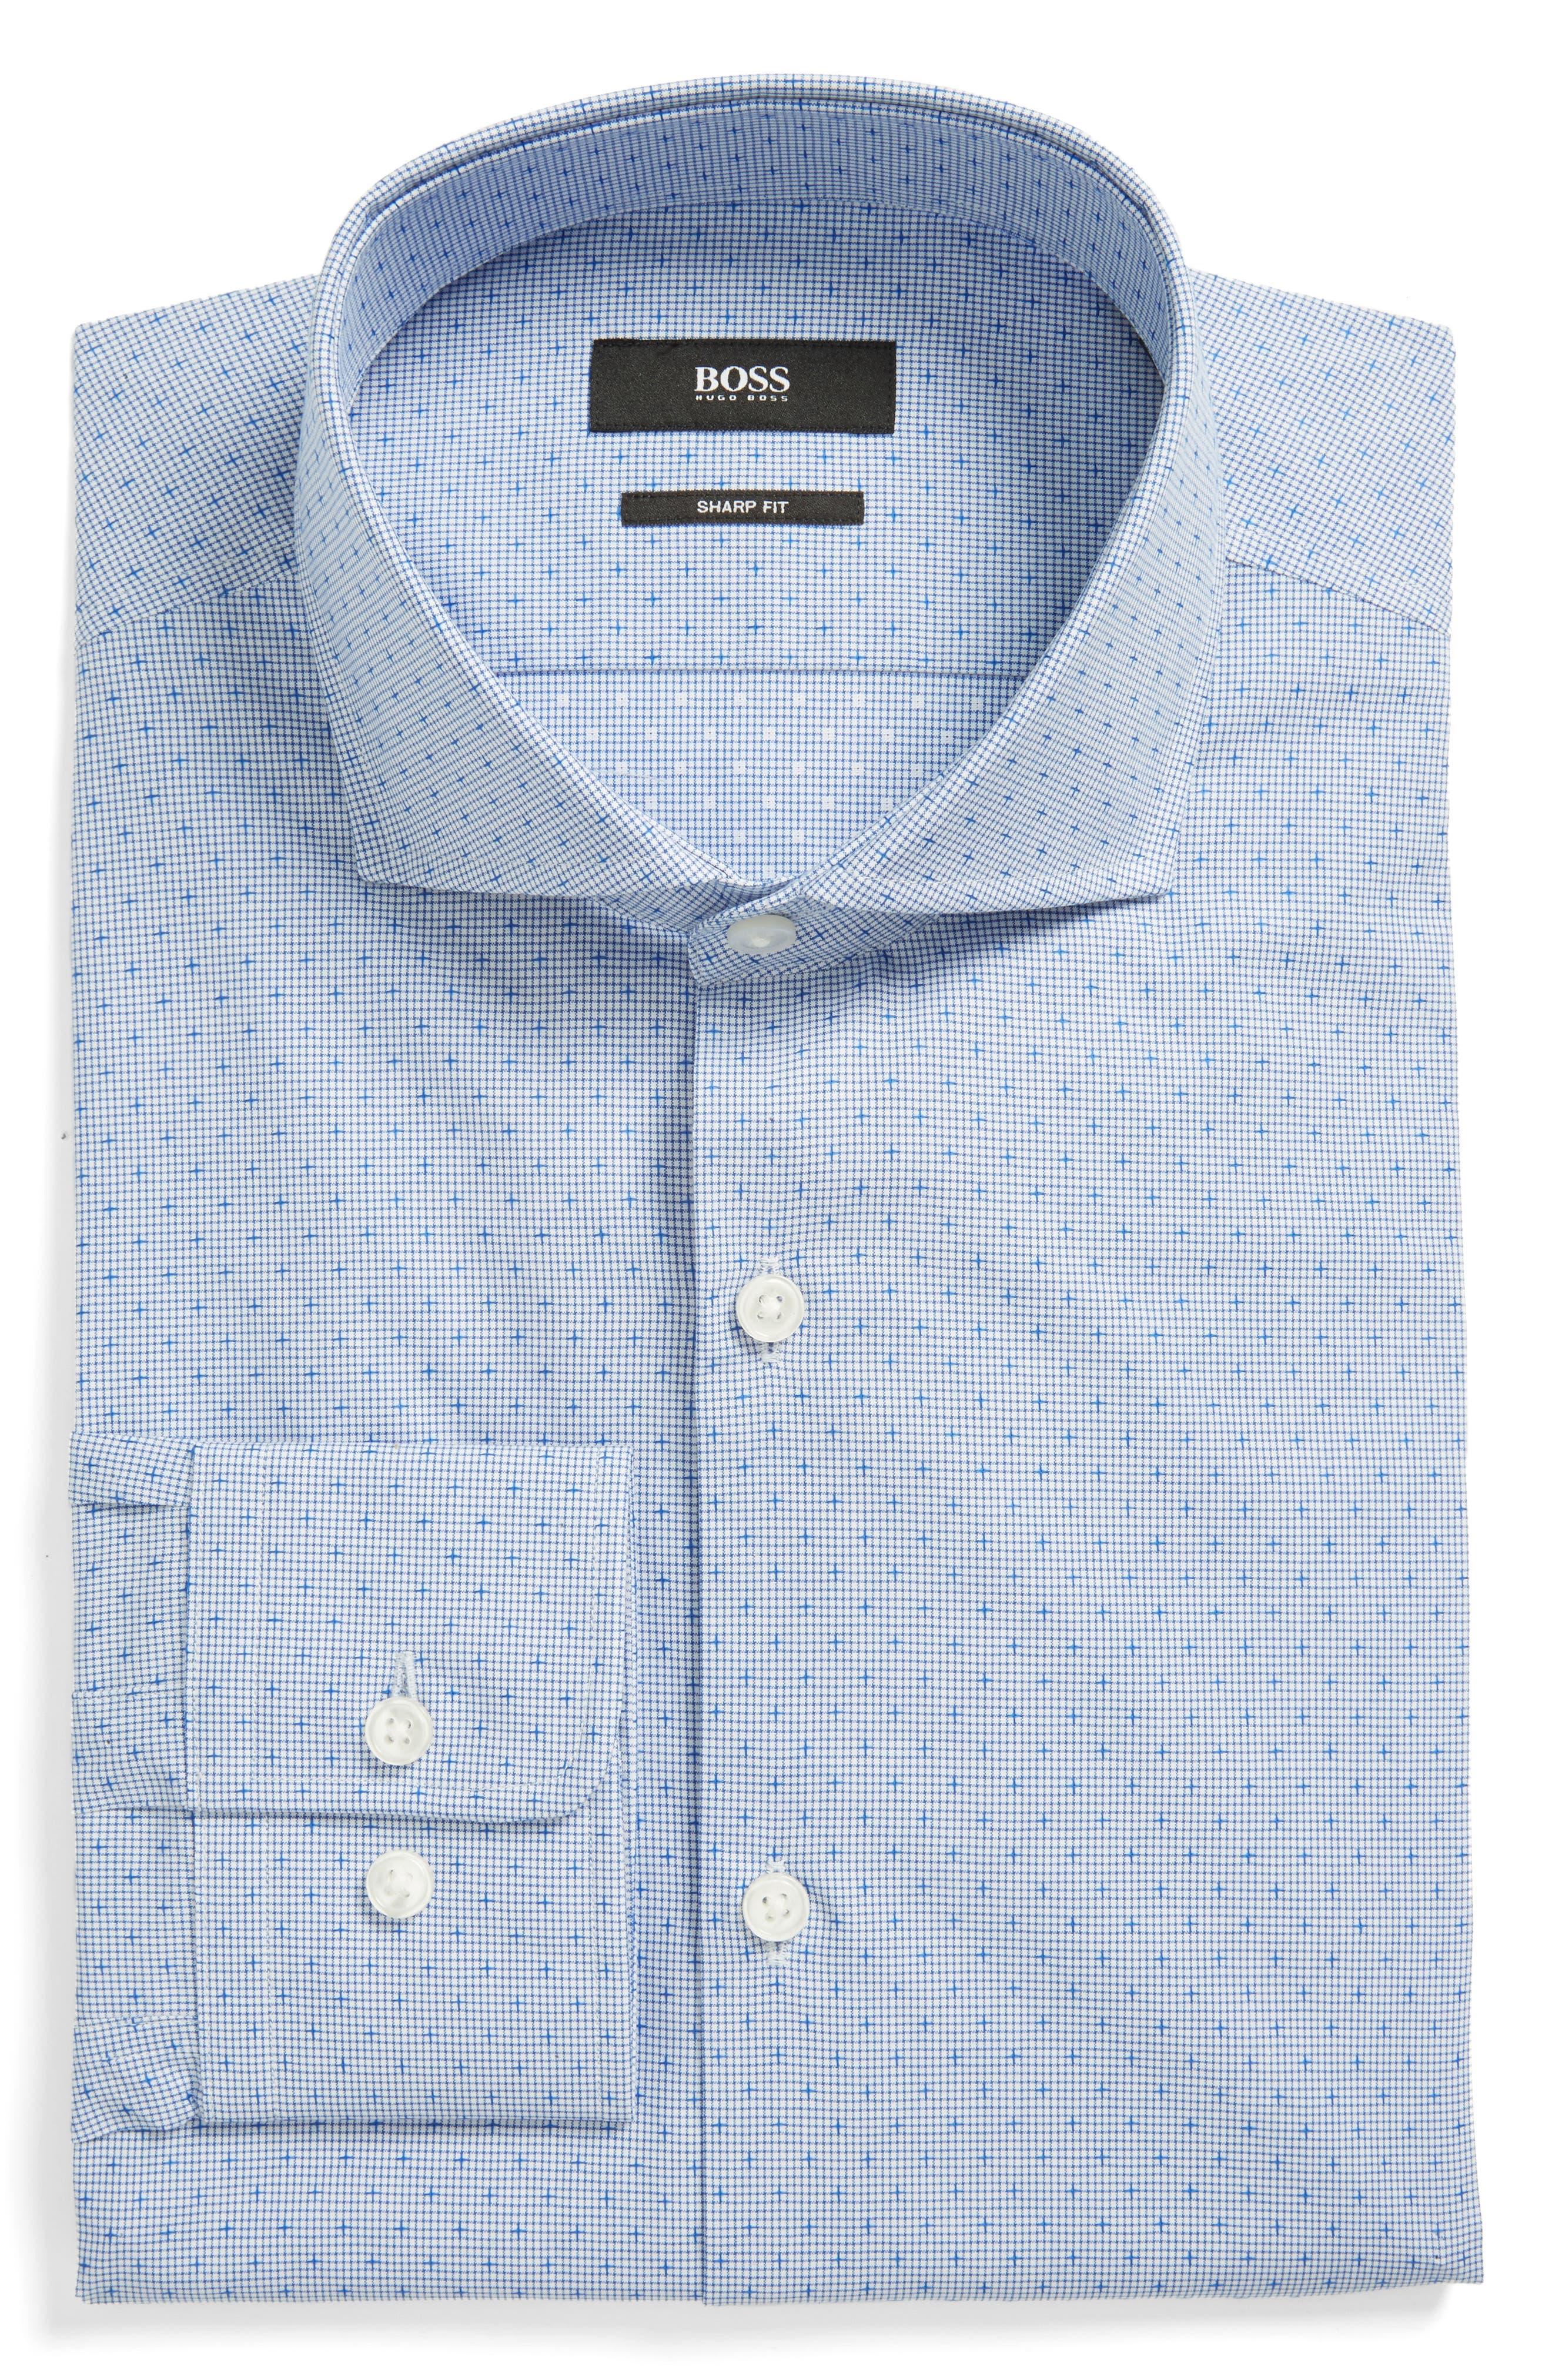 BOSS Mark Sharp Fit Dobby Dress Shirt